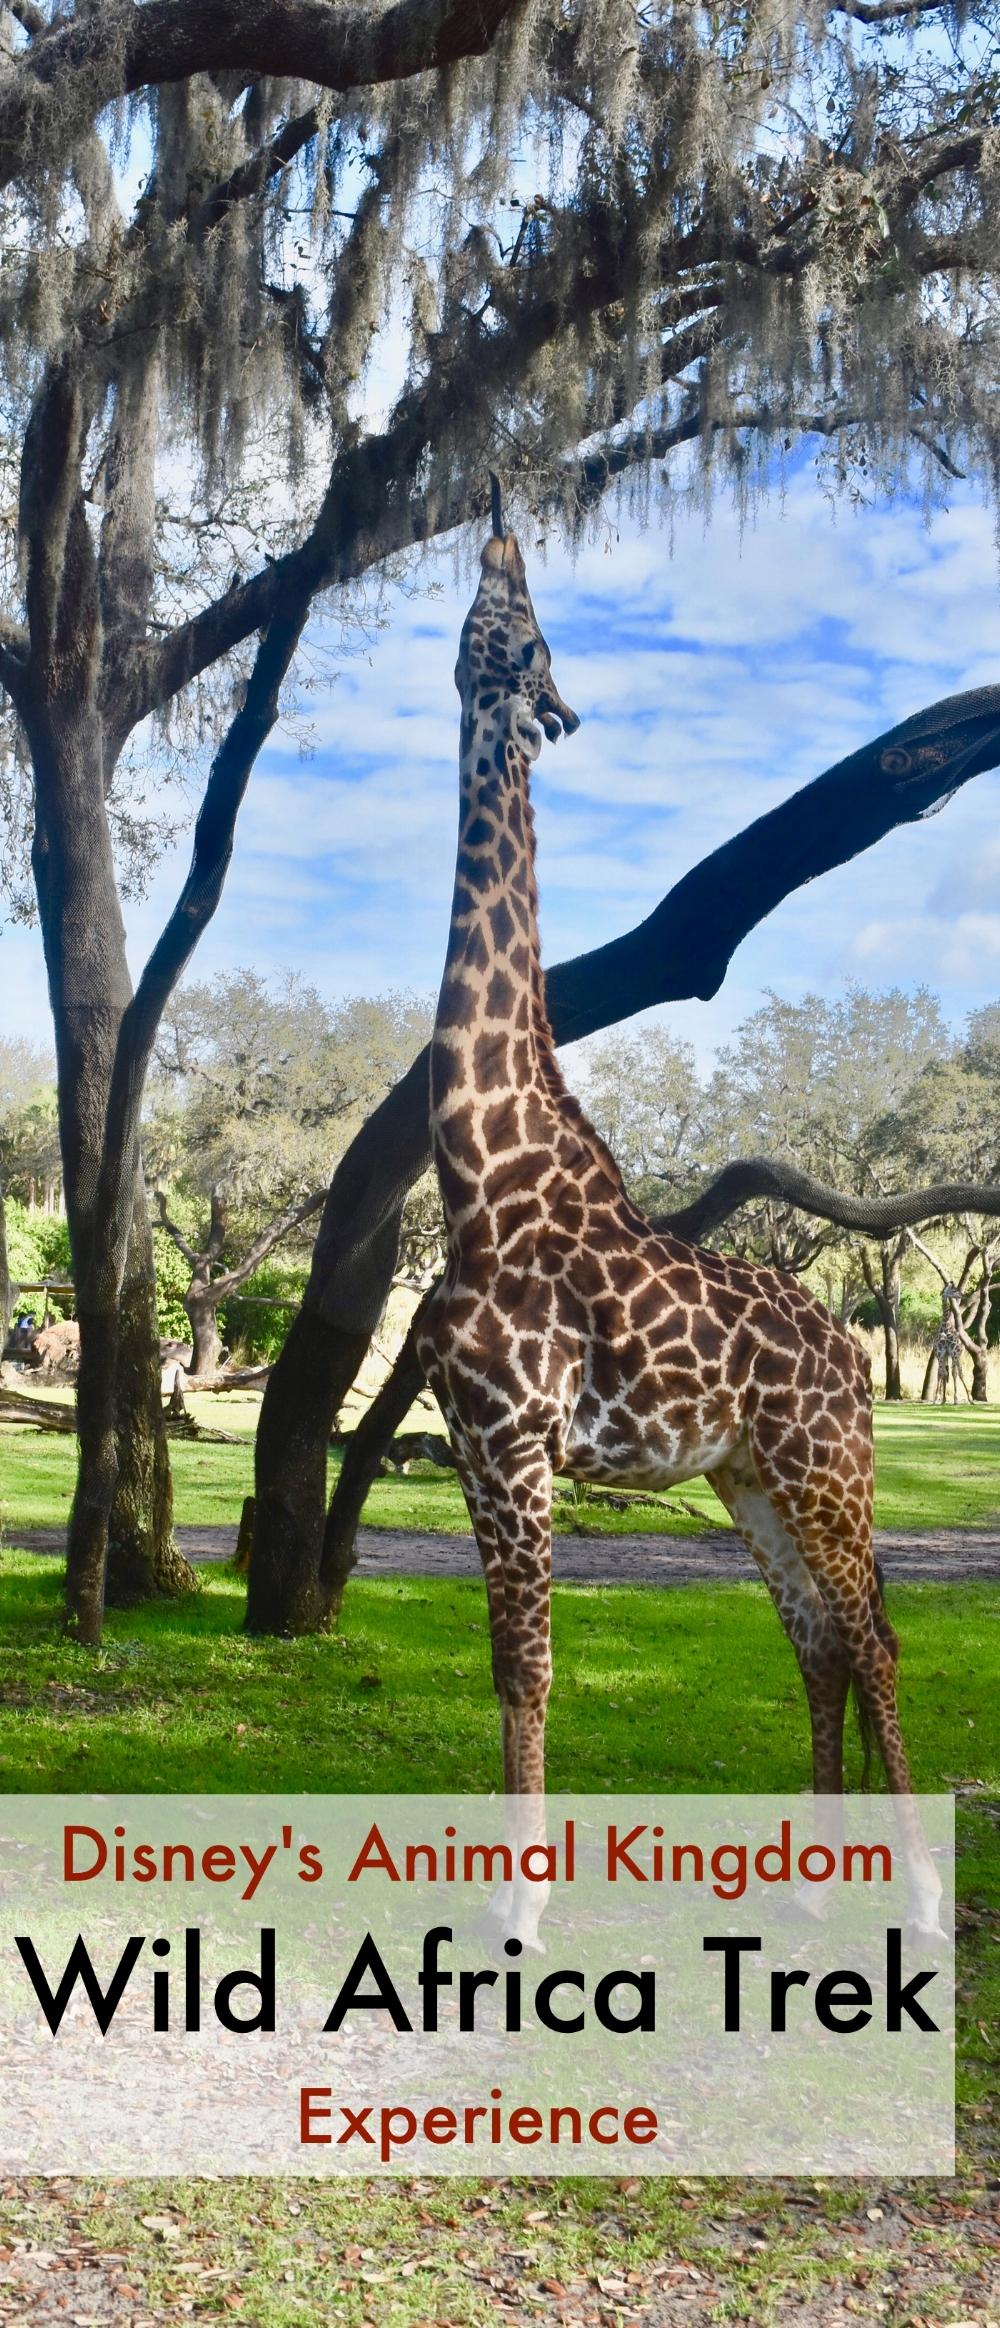 Disney's Animal Kingdom Wild Africa Trek Experience - A Happy Passport. #disneyworld #wildafricatrek #animalkingdom